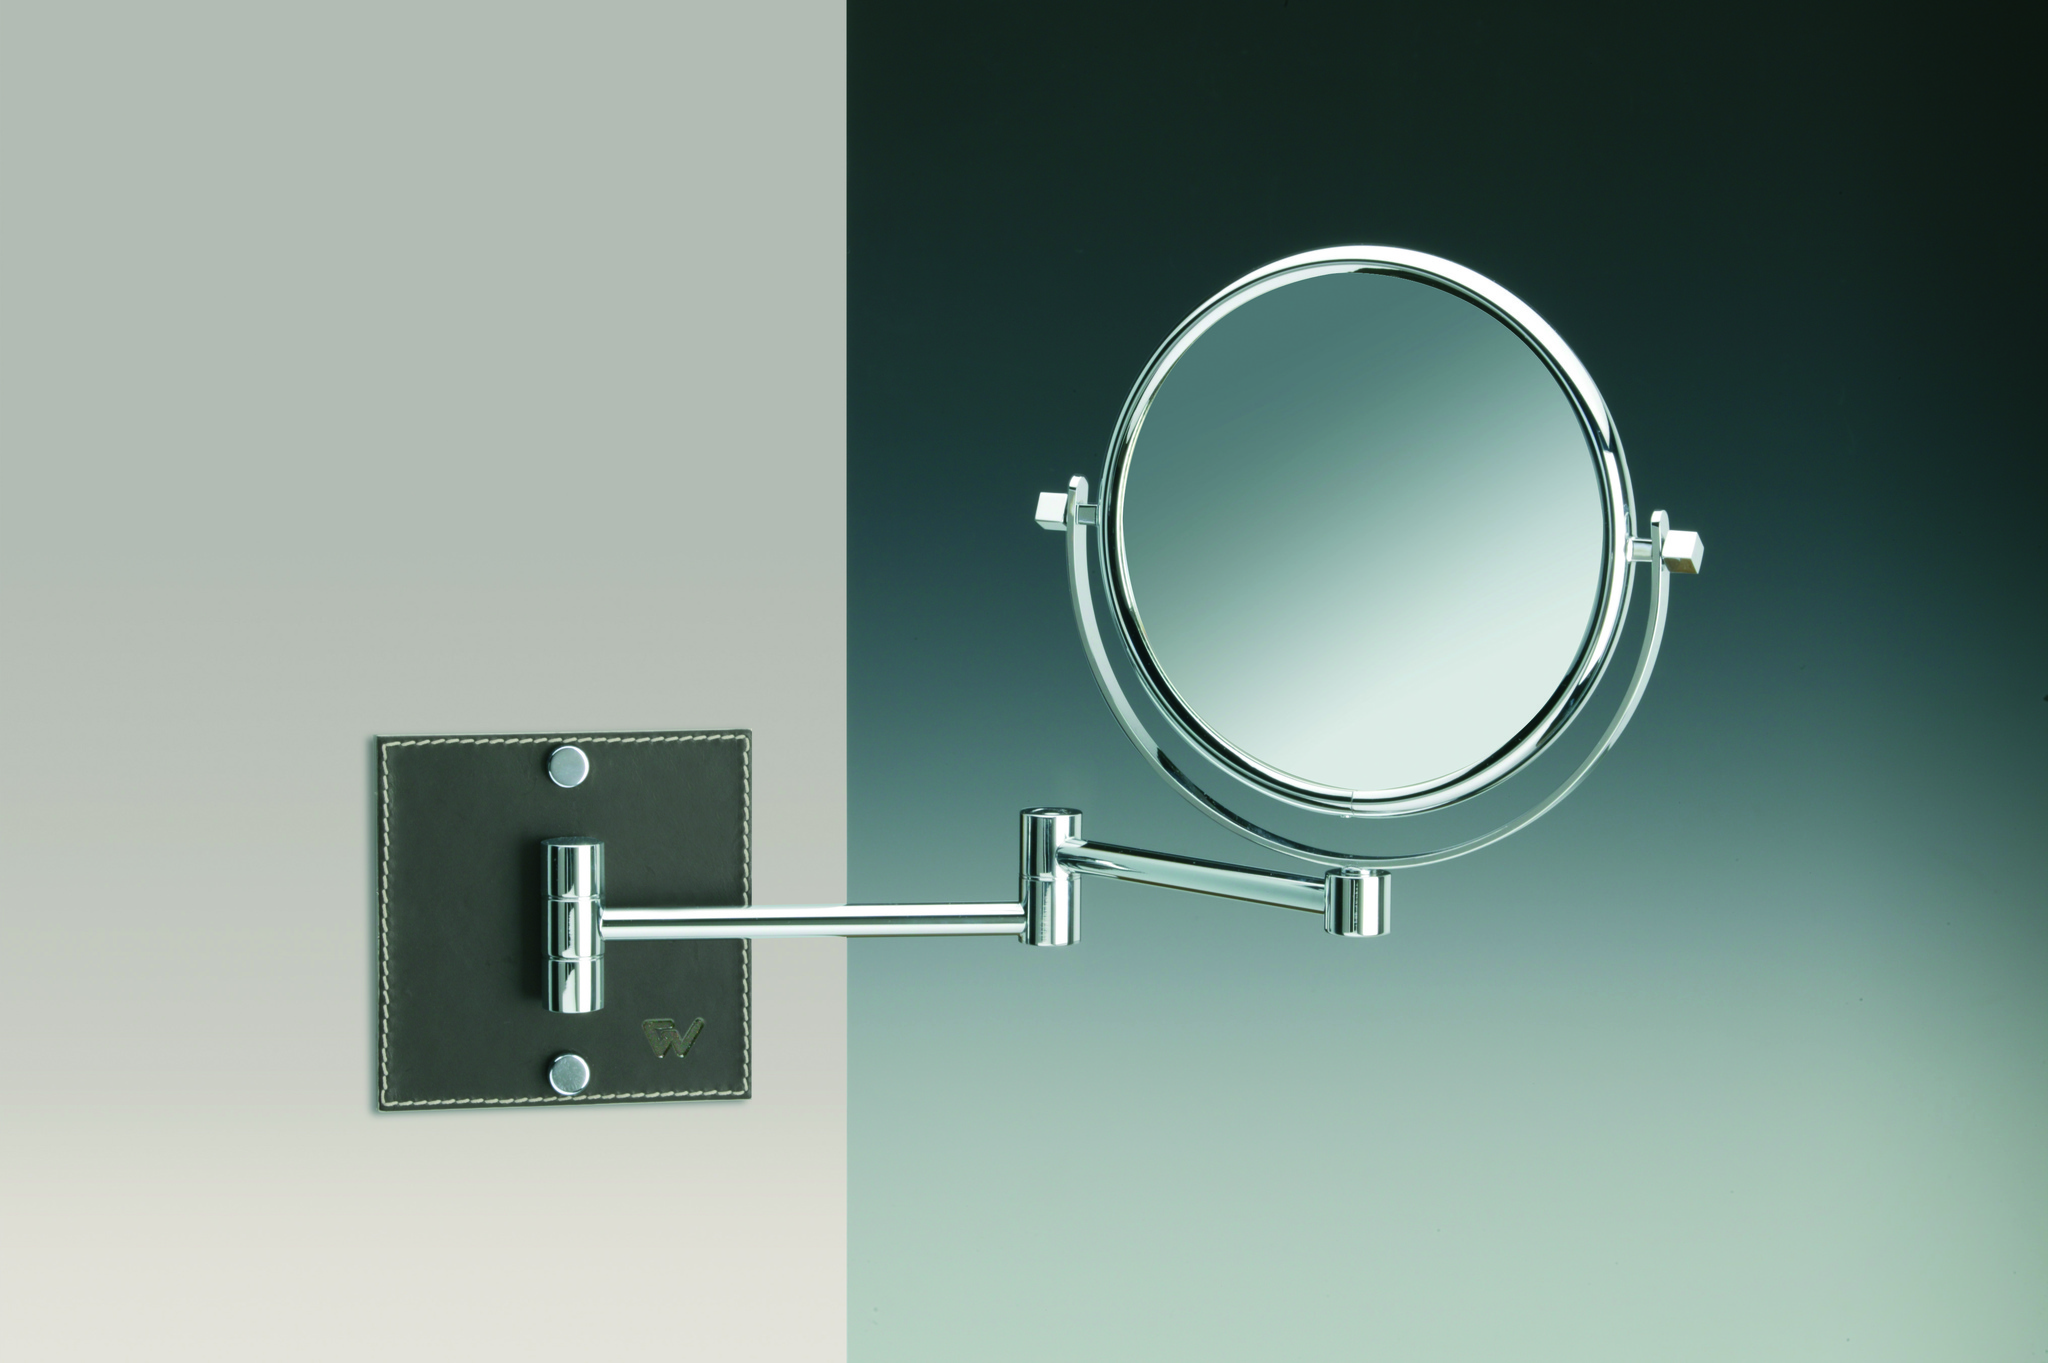 Зеркала Зеркало косметическое Windisch 99337R 2X Kenia elitnoe-zerkalo-kosmeticheskoe-99337-kenia-ot-windisch-ispaniya.jpg